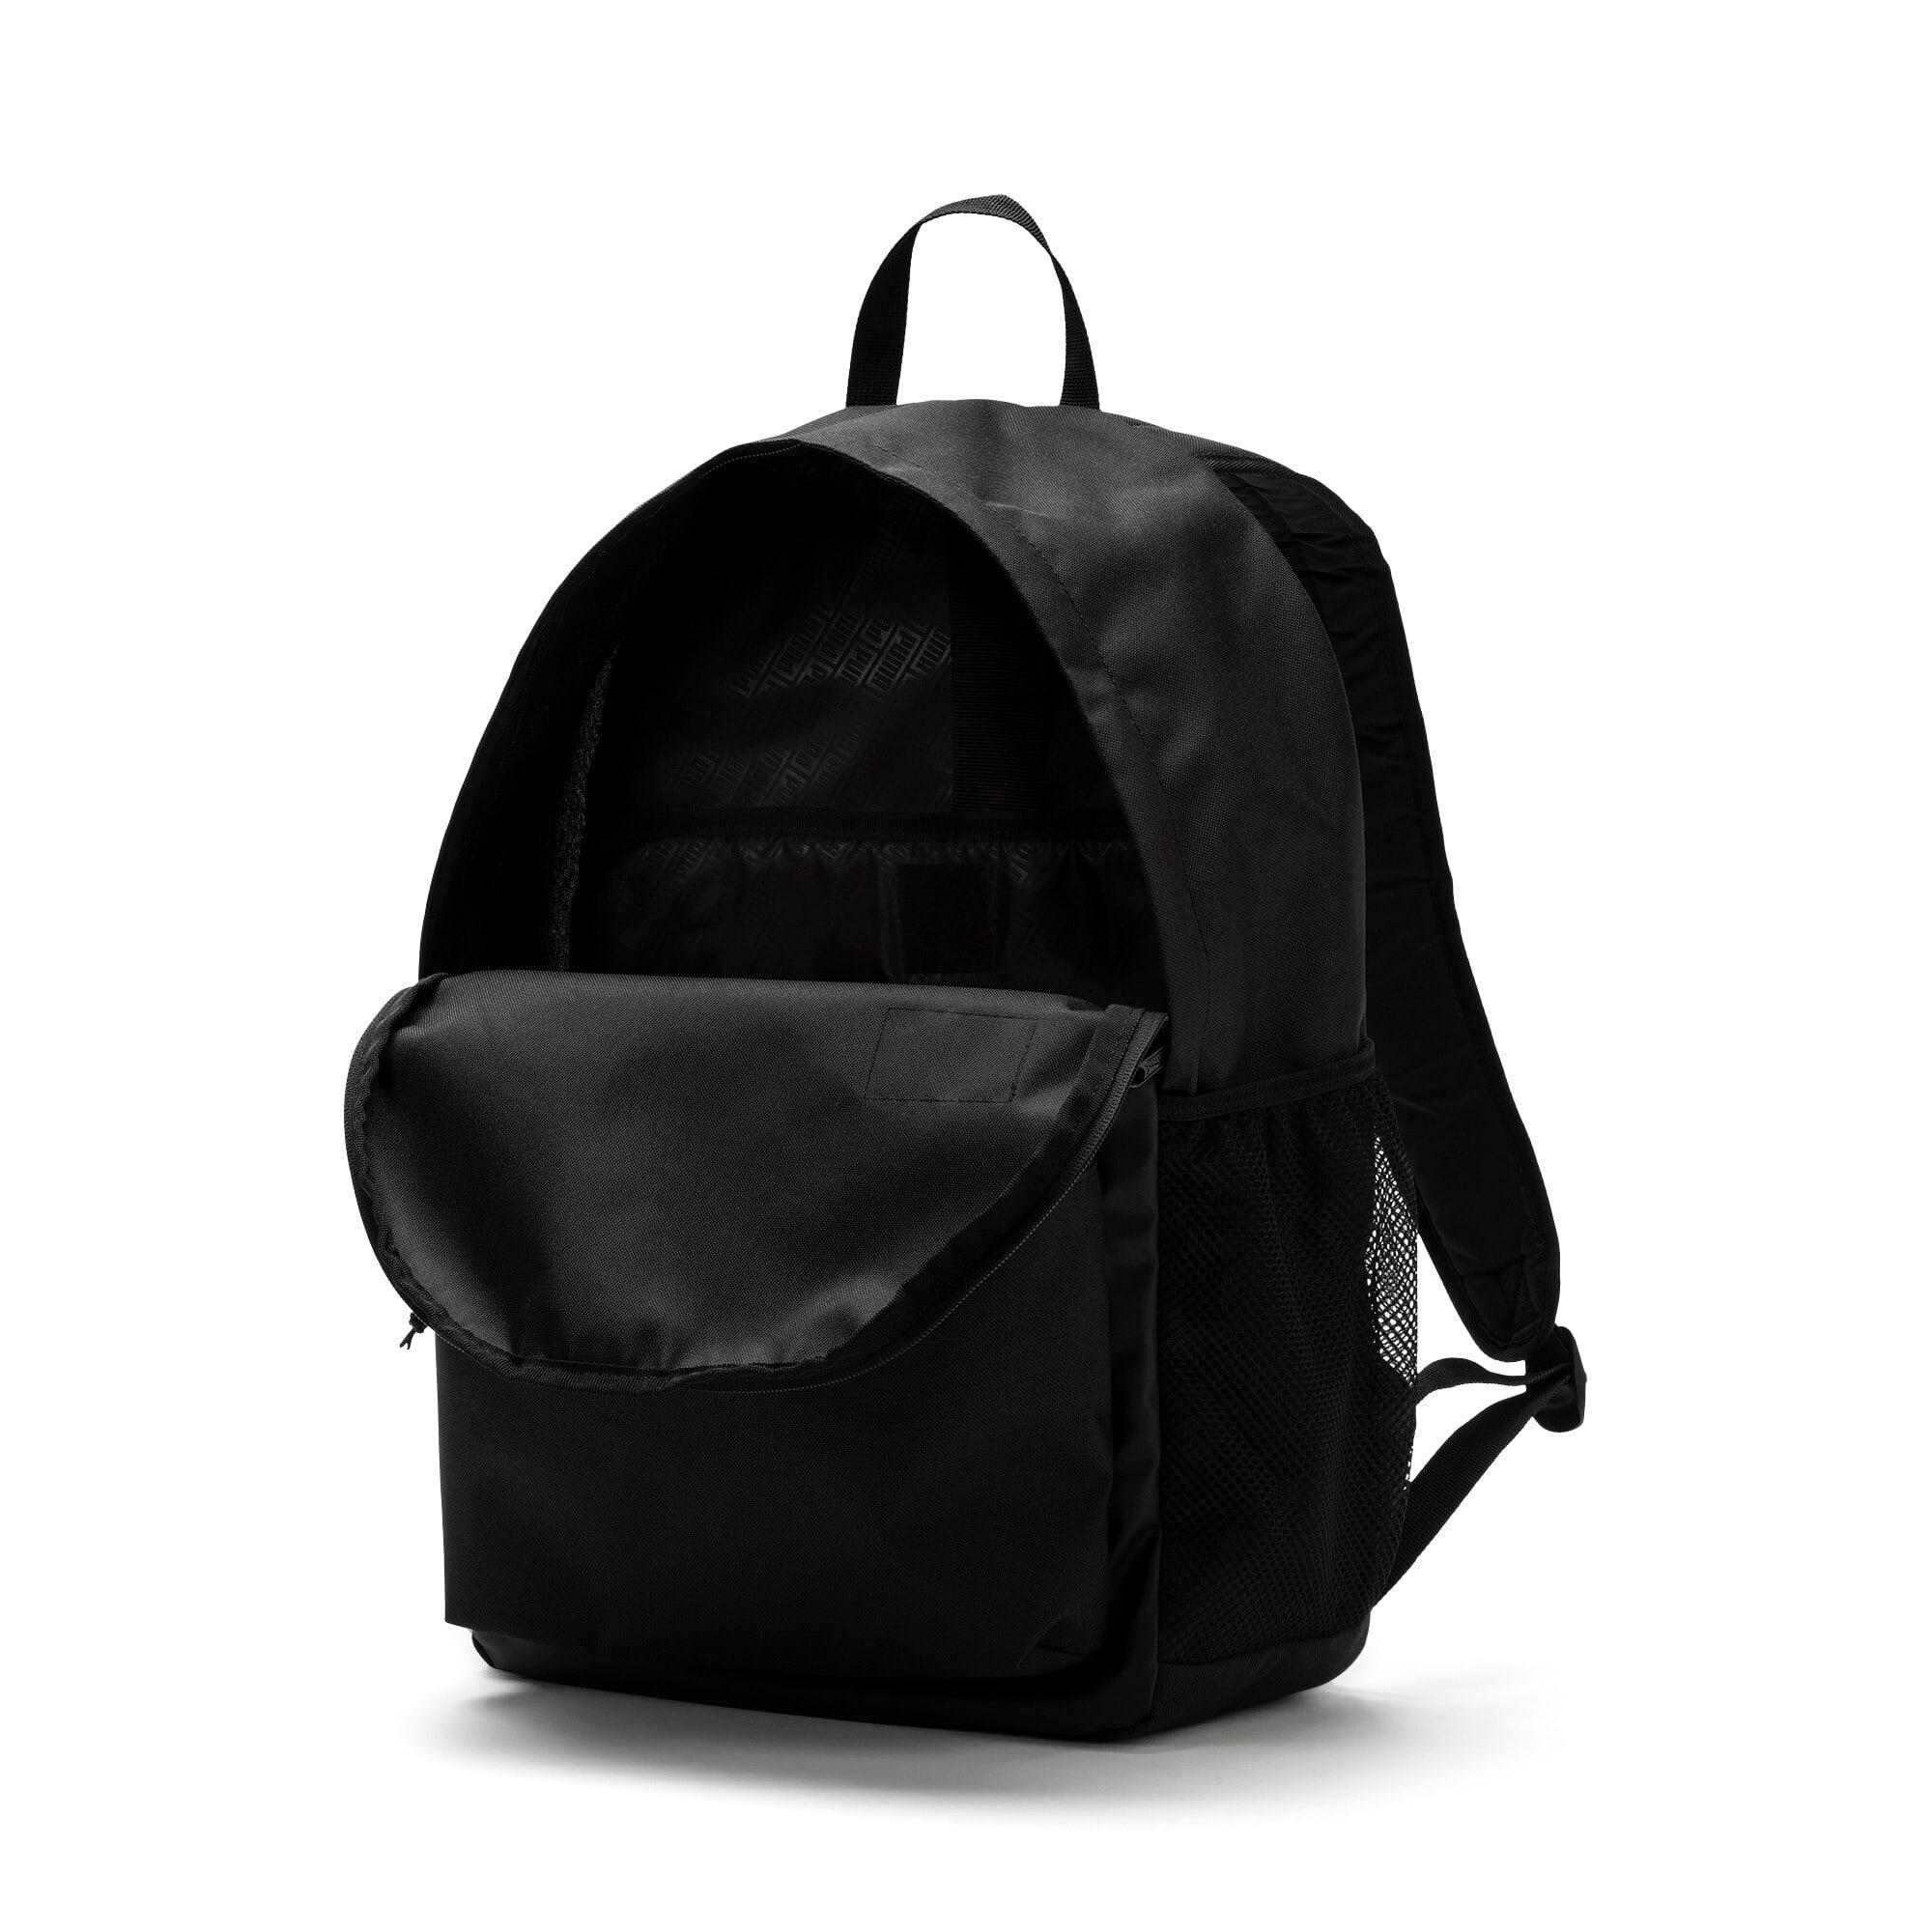 Thumbnail 3 of PUMA Academy Backpack, Puma Black, medium